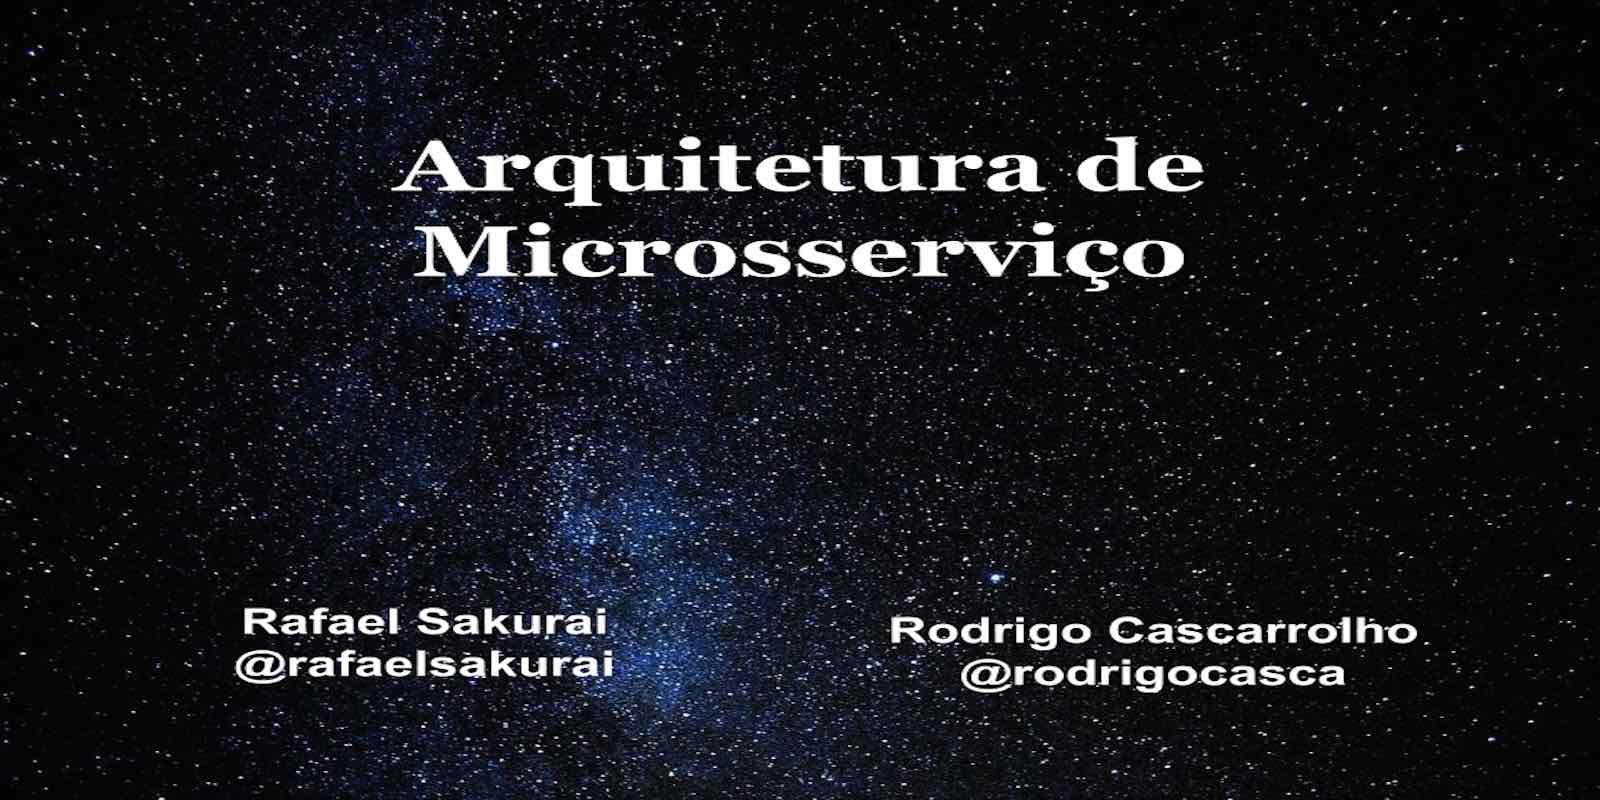 Arquitetura de Microsserviço